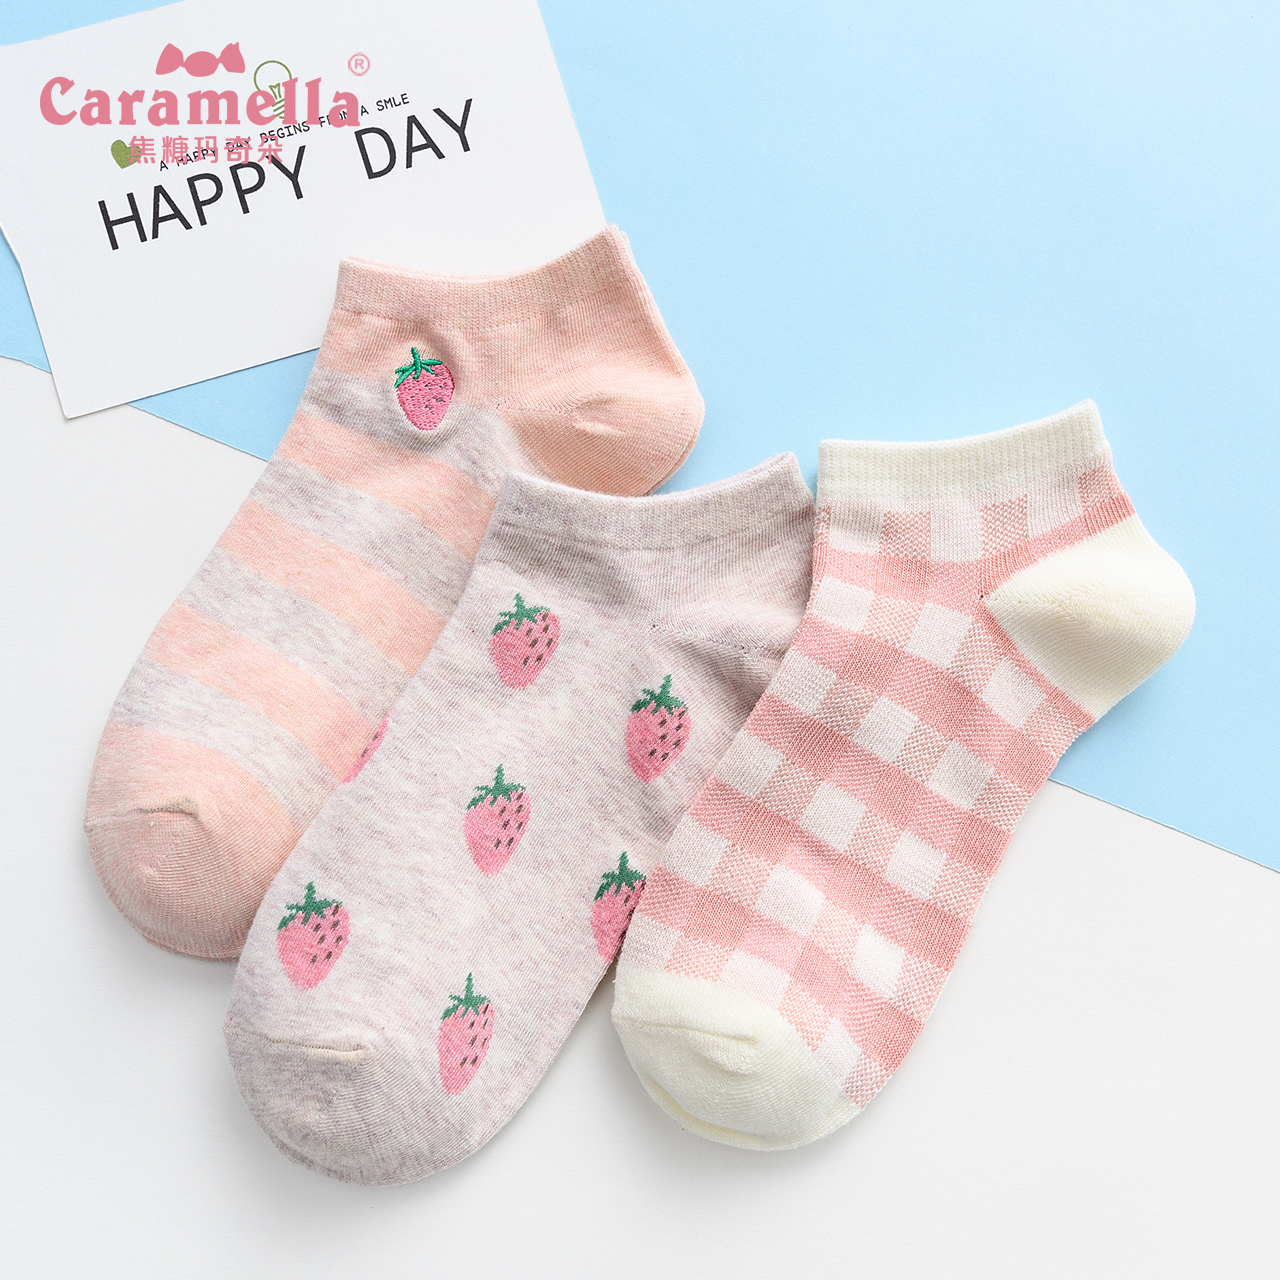 CARAMELLA袜子女短袜浅口春夏女士船袜可爱日系学院风隐形袜棉袜